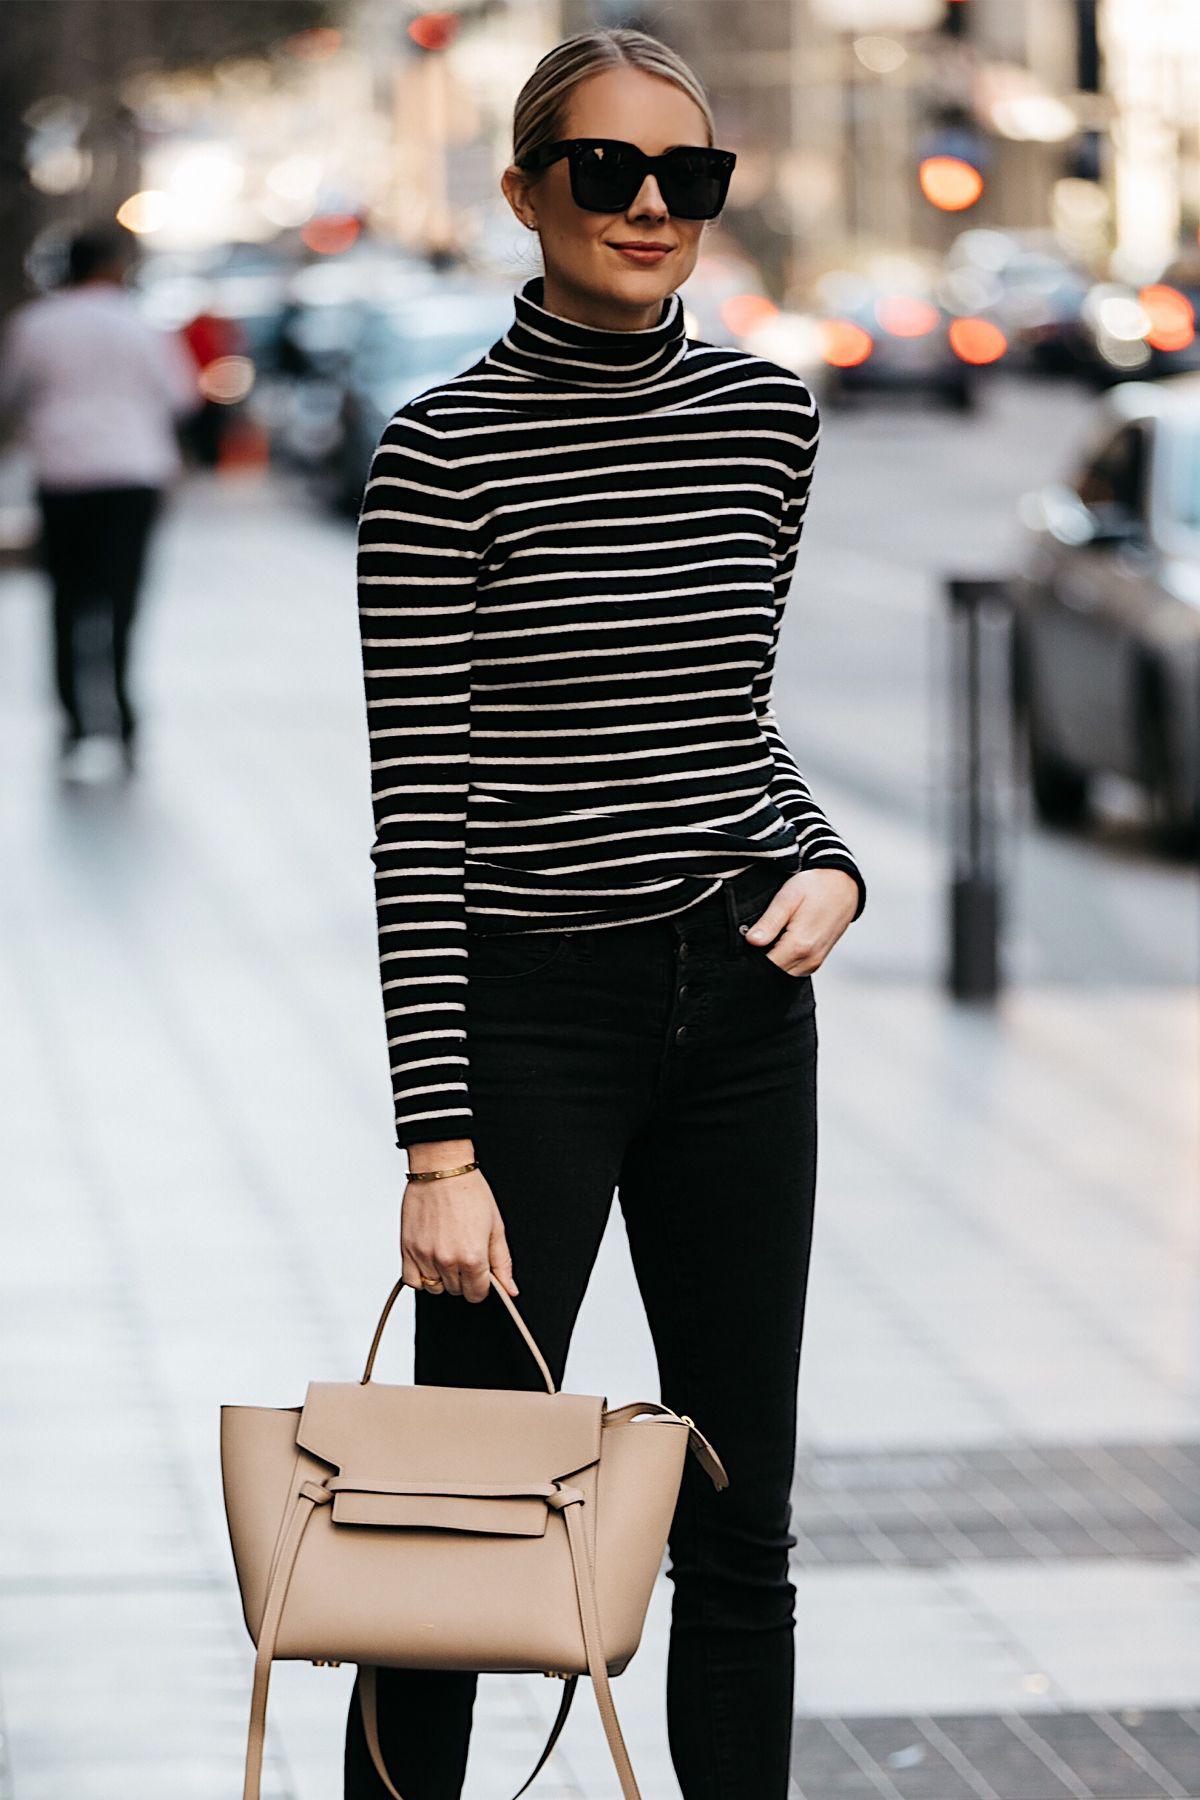 Fashion Jackson Nordstrom Black White Striped Turtleneck Sweater Black Skinny Jeans Celine Mini Belt Bag